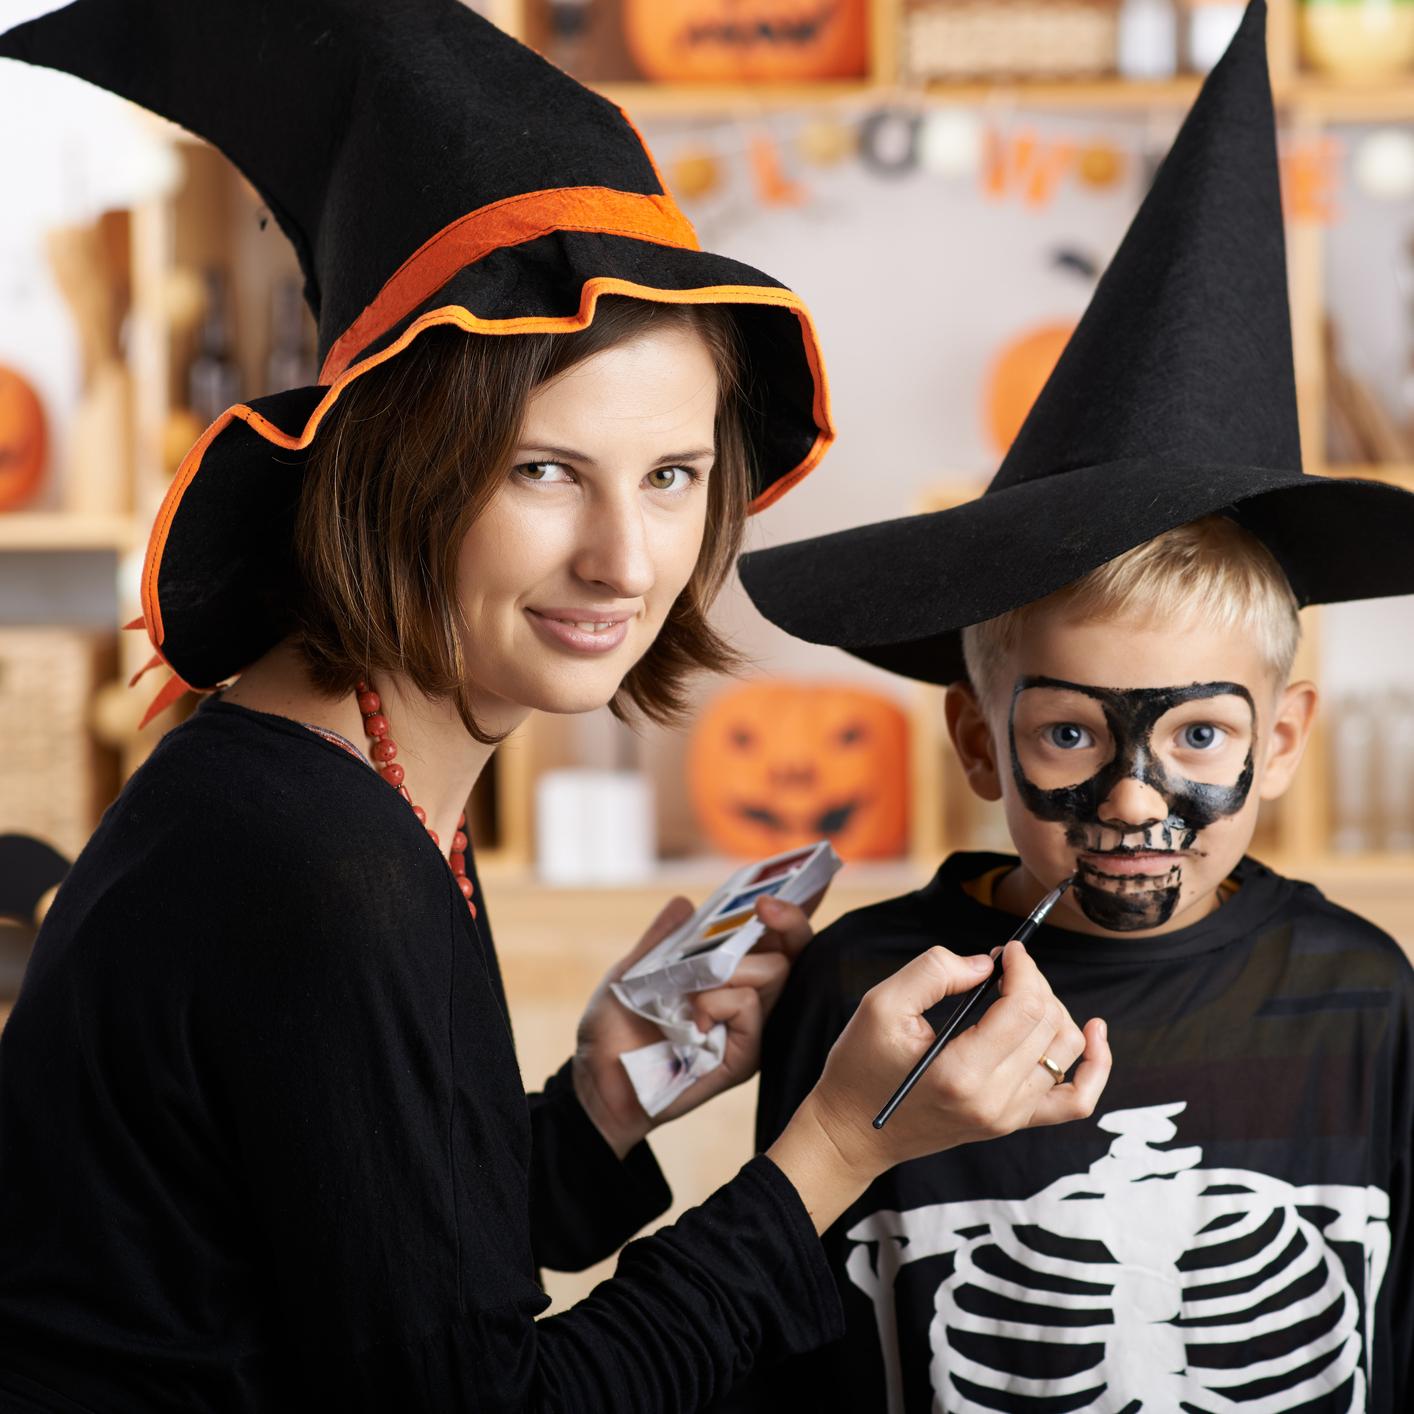 5 Fun Ways to Celebrate Halloween